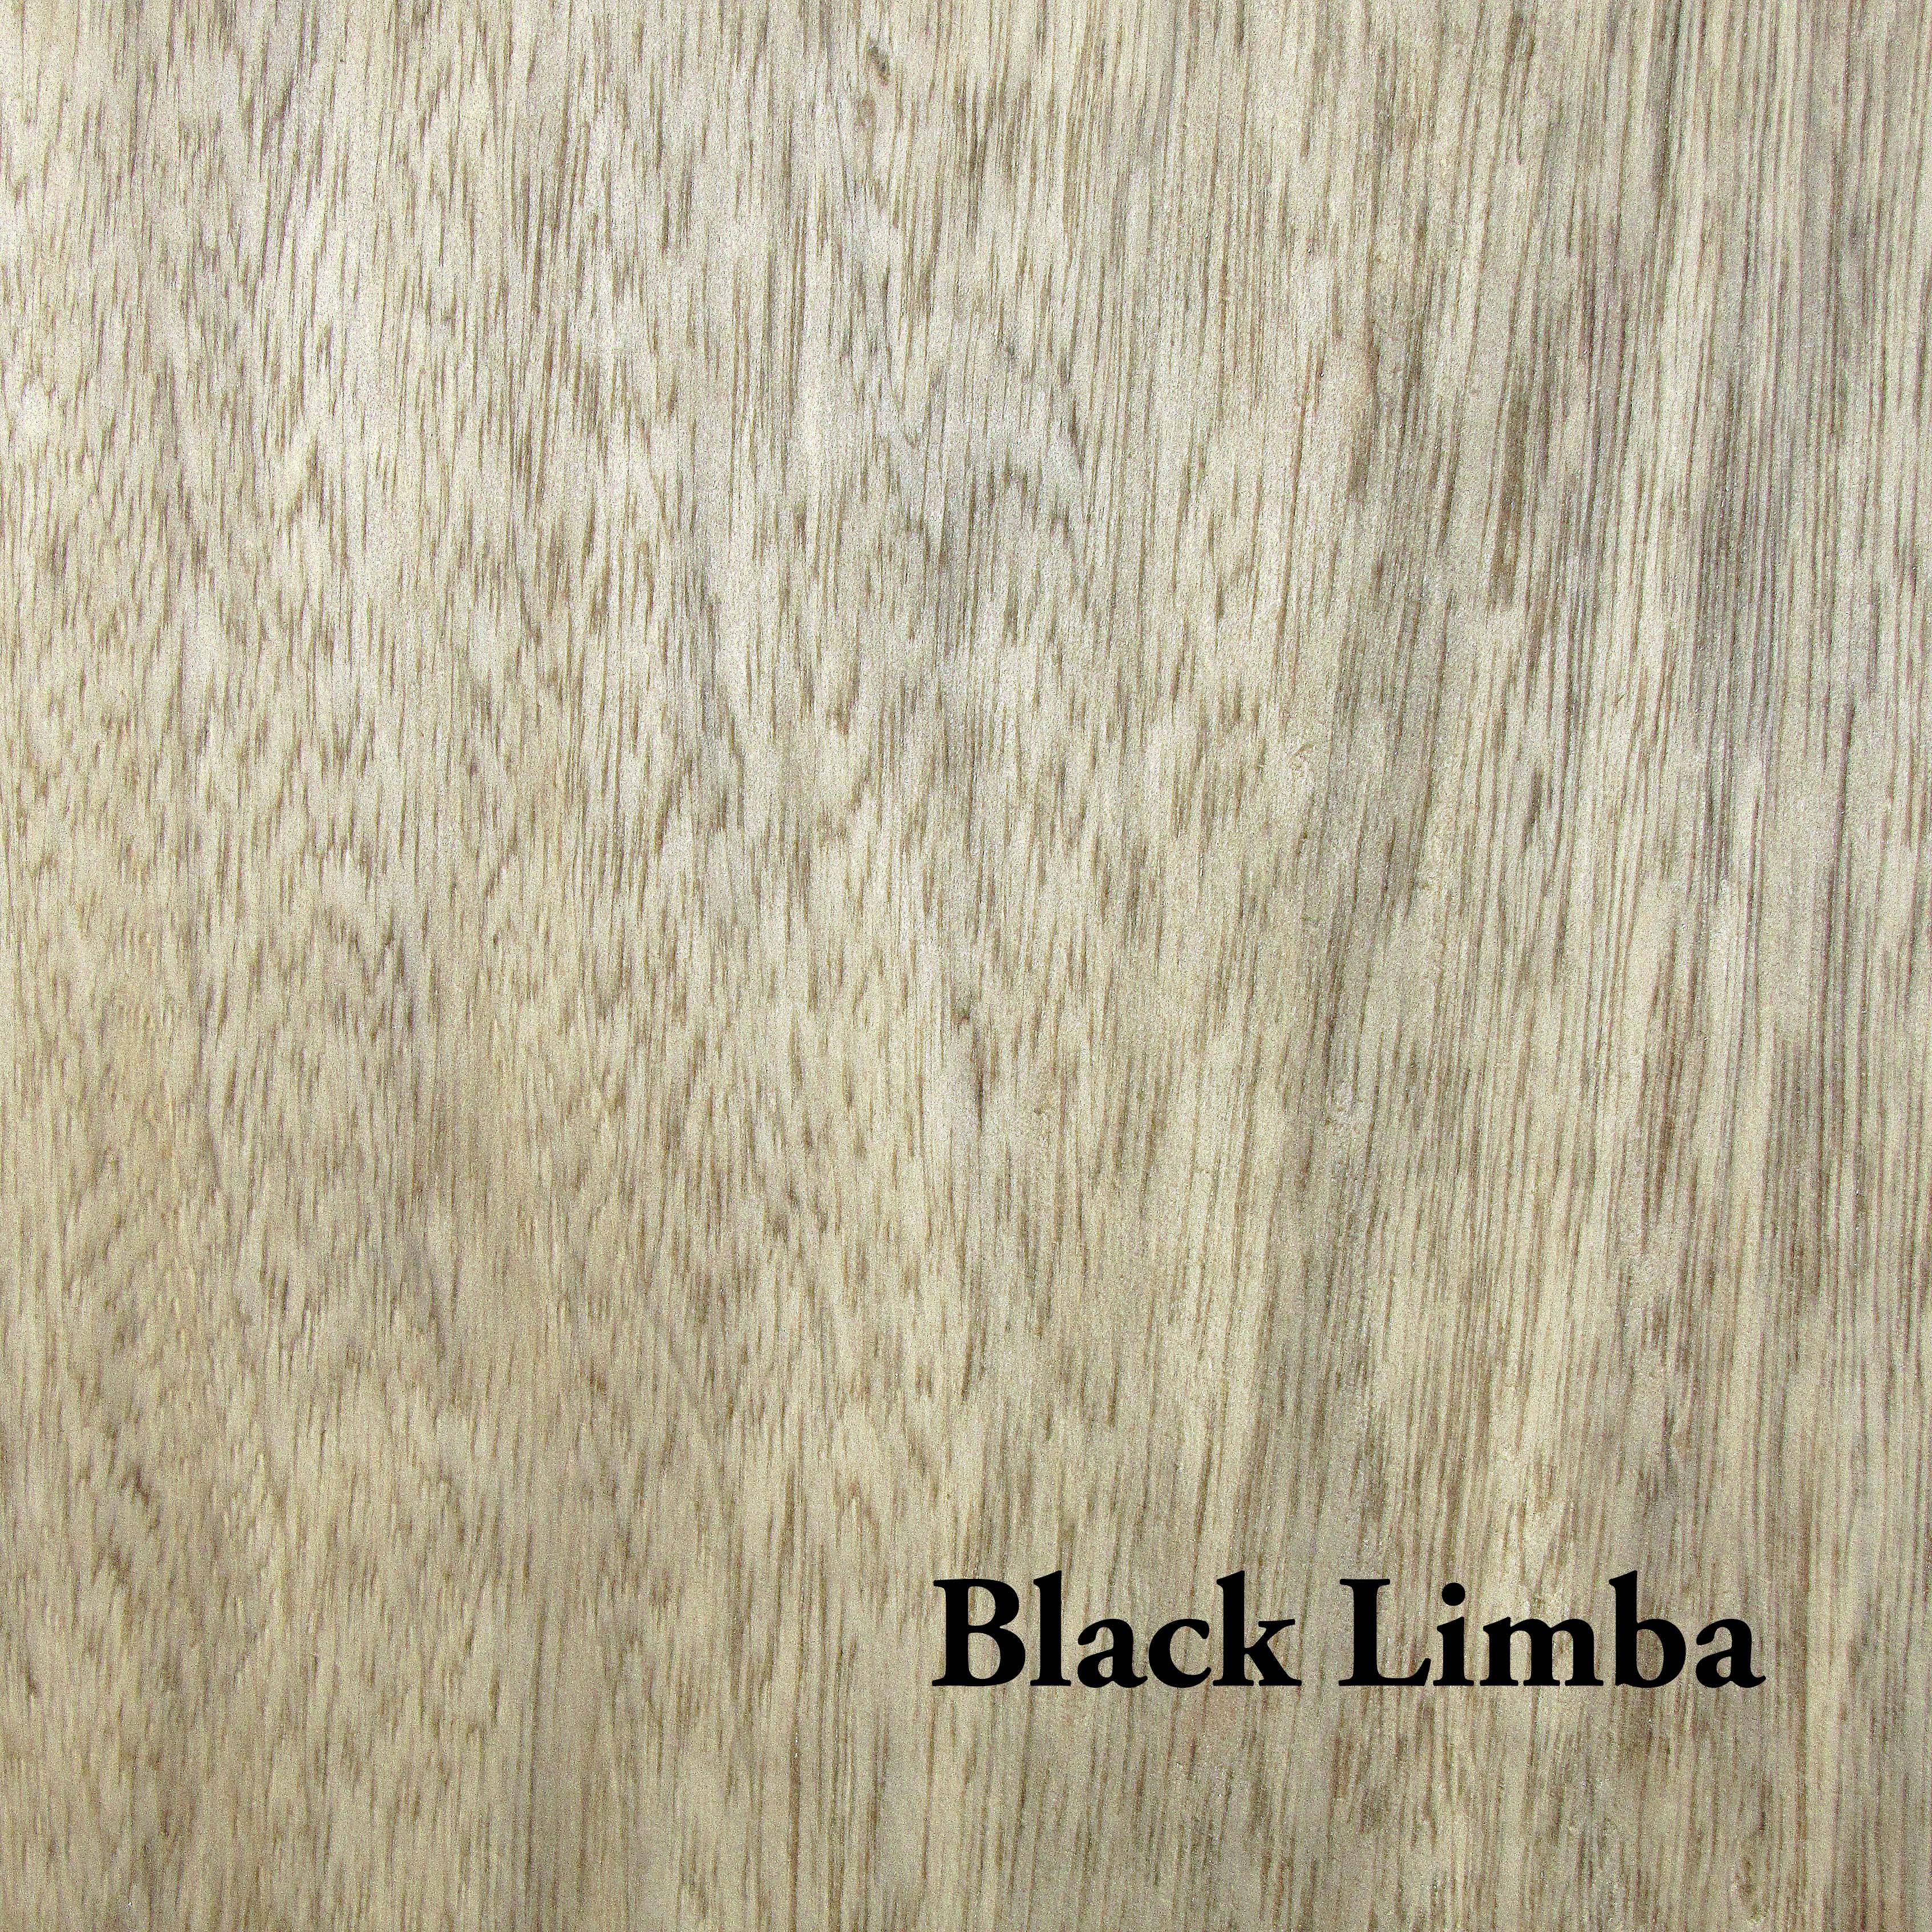 Limba Black Hardwood S2s Capitol City Lumber